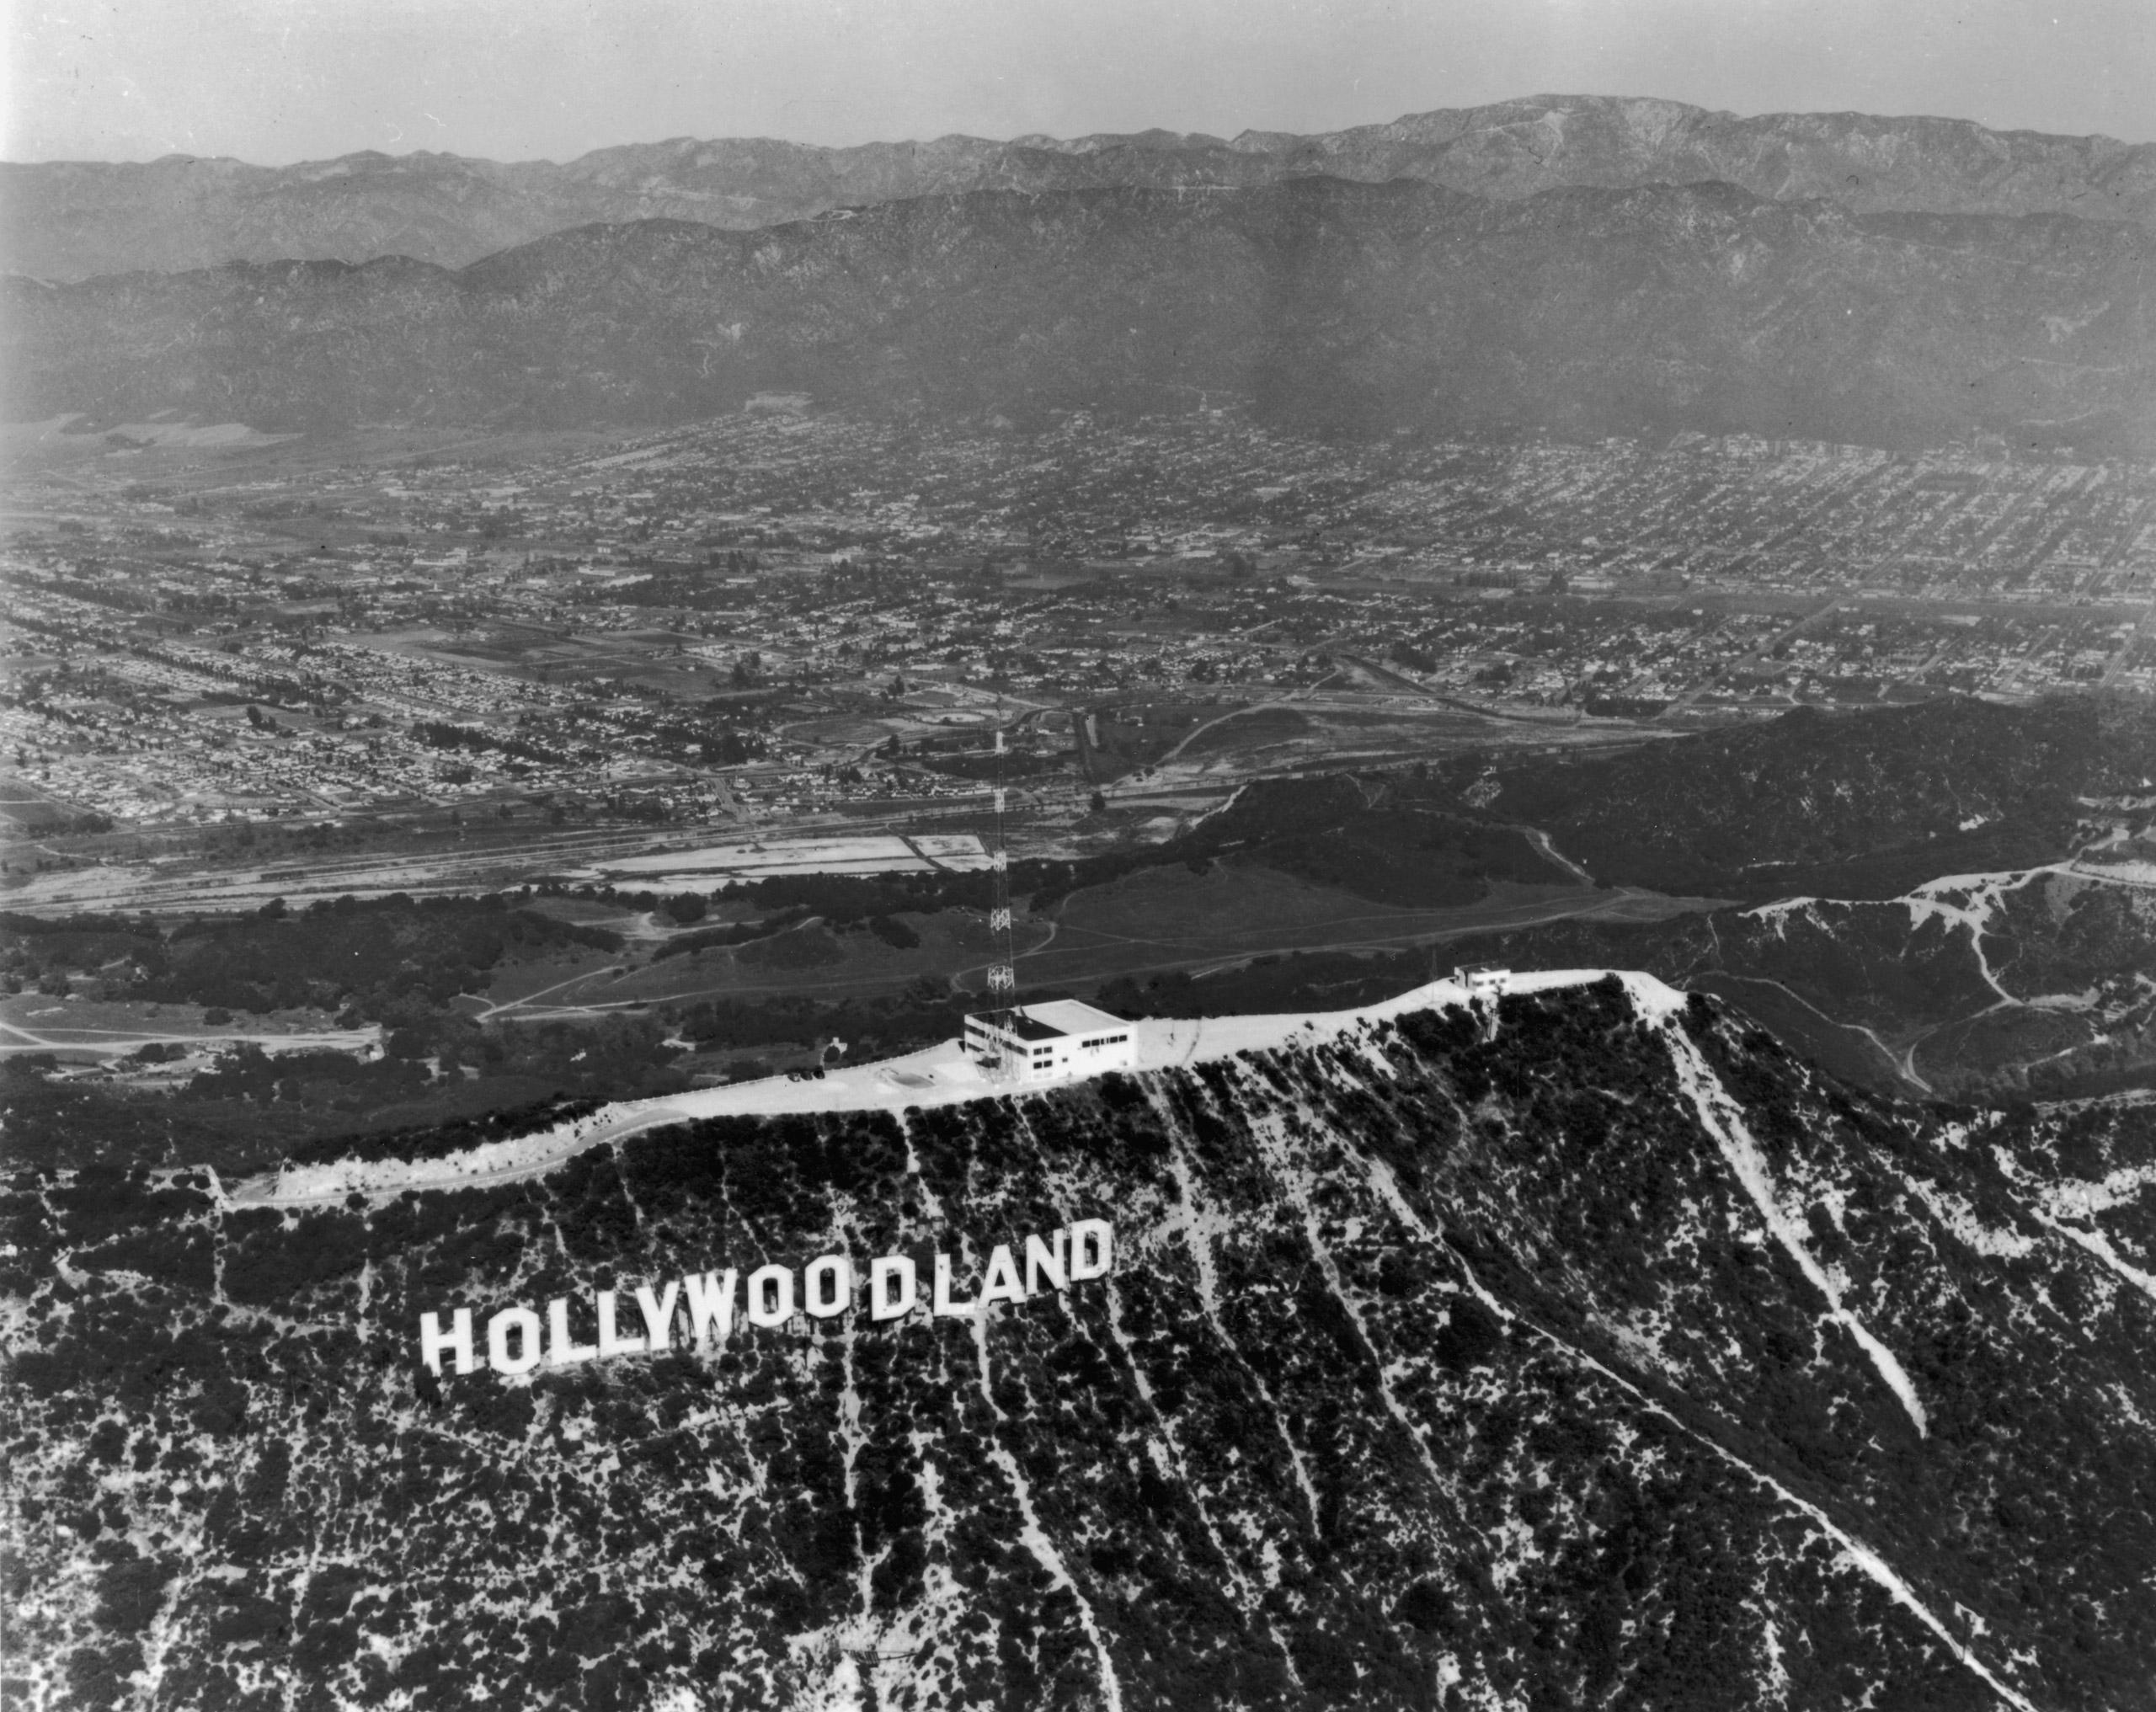 Hollywoodland sign, Hollywood, California, 1935.